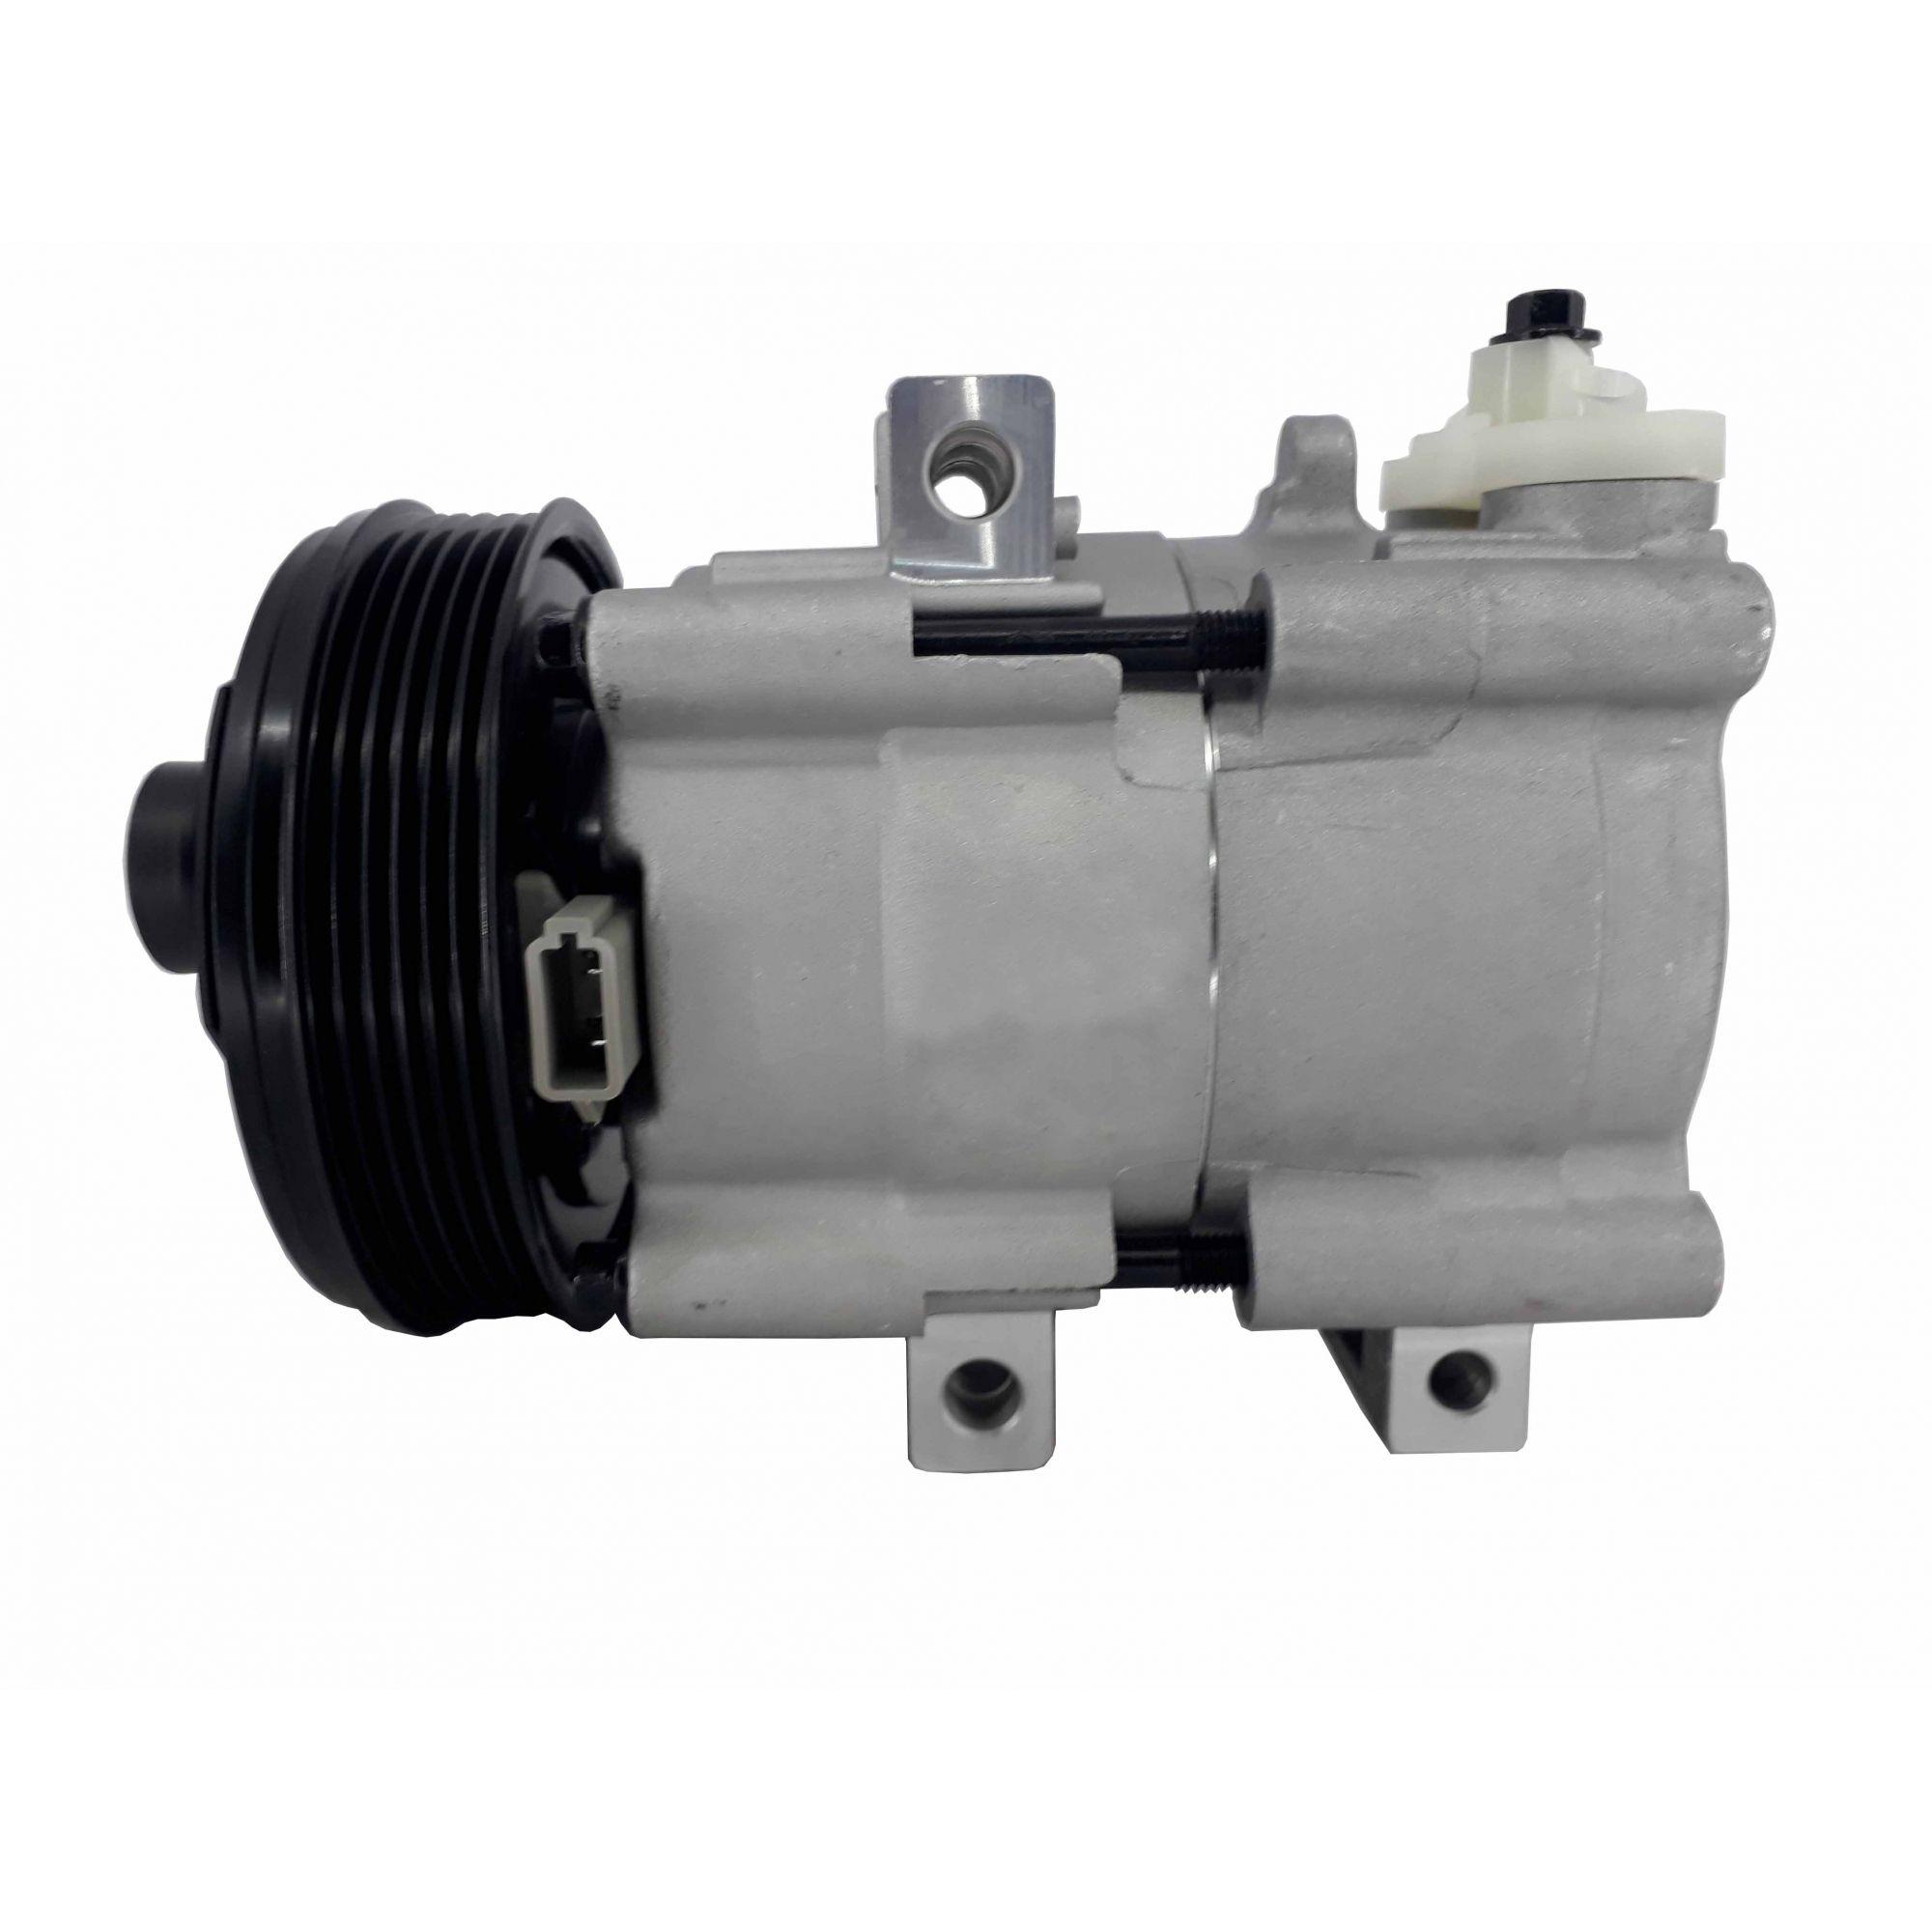 Compressor fic Ford F250 Diesel + Brinde